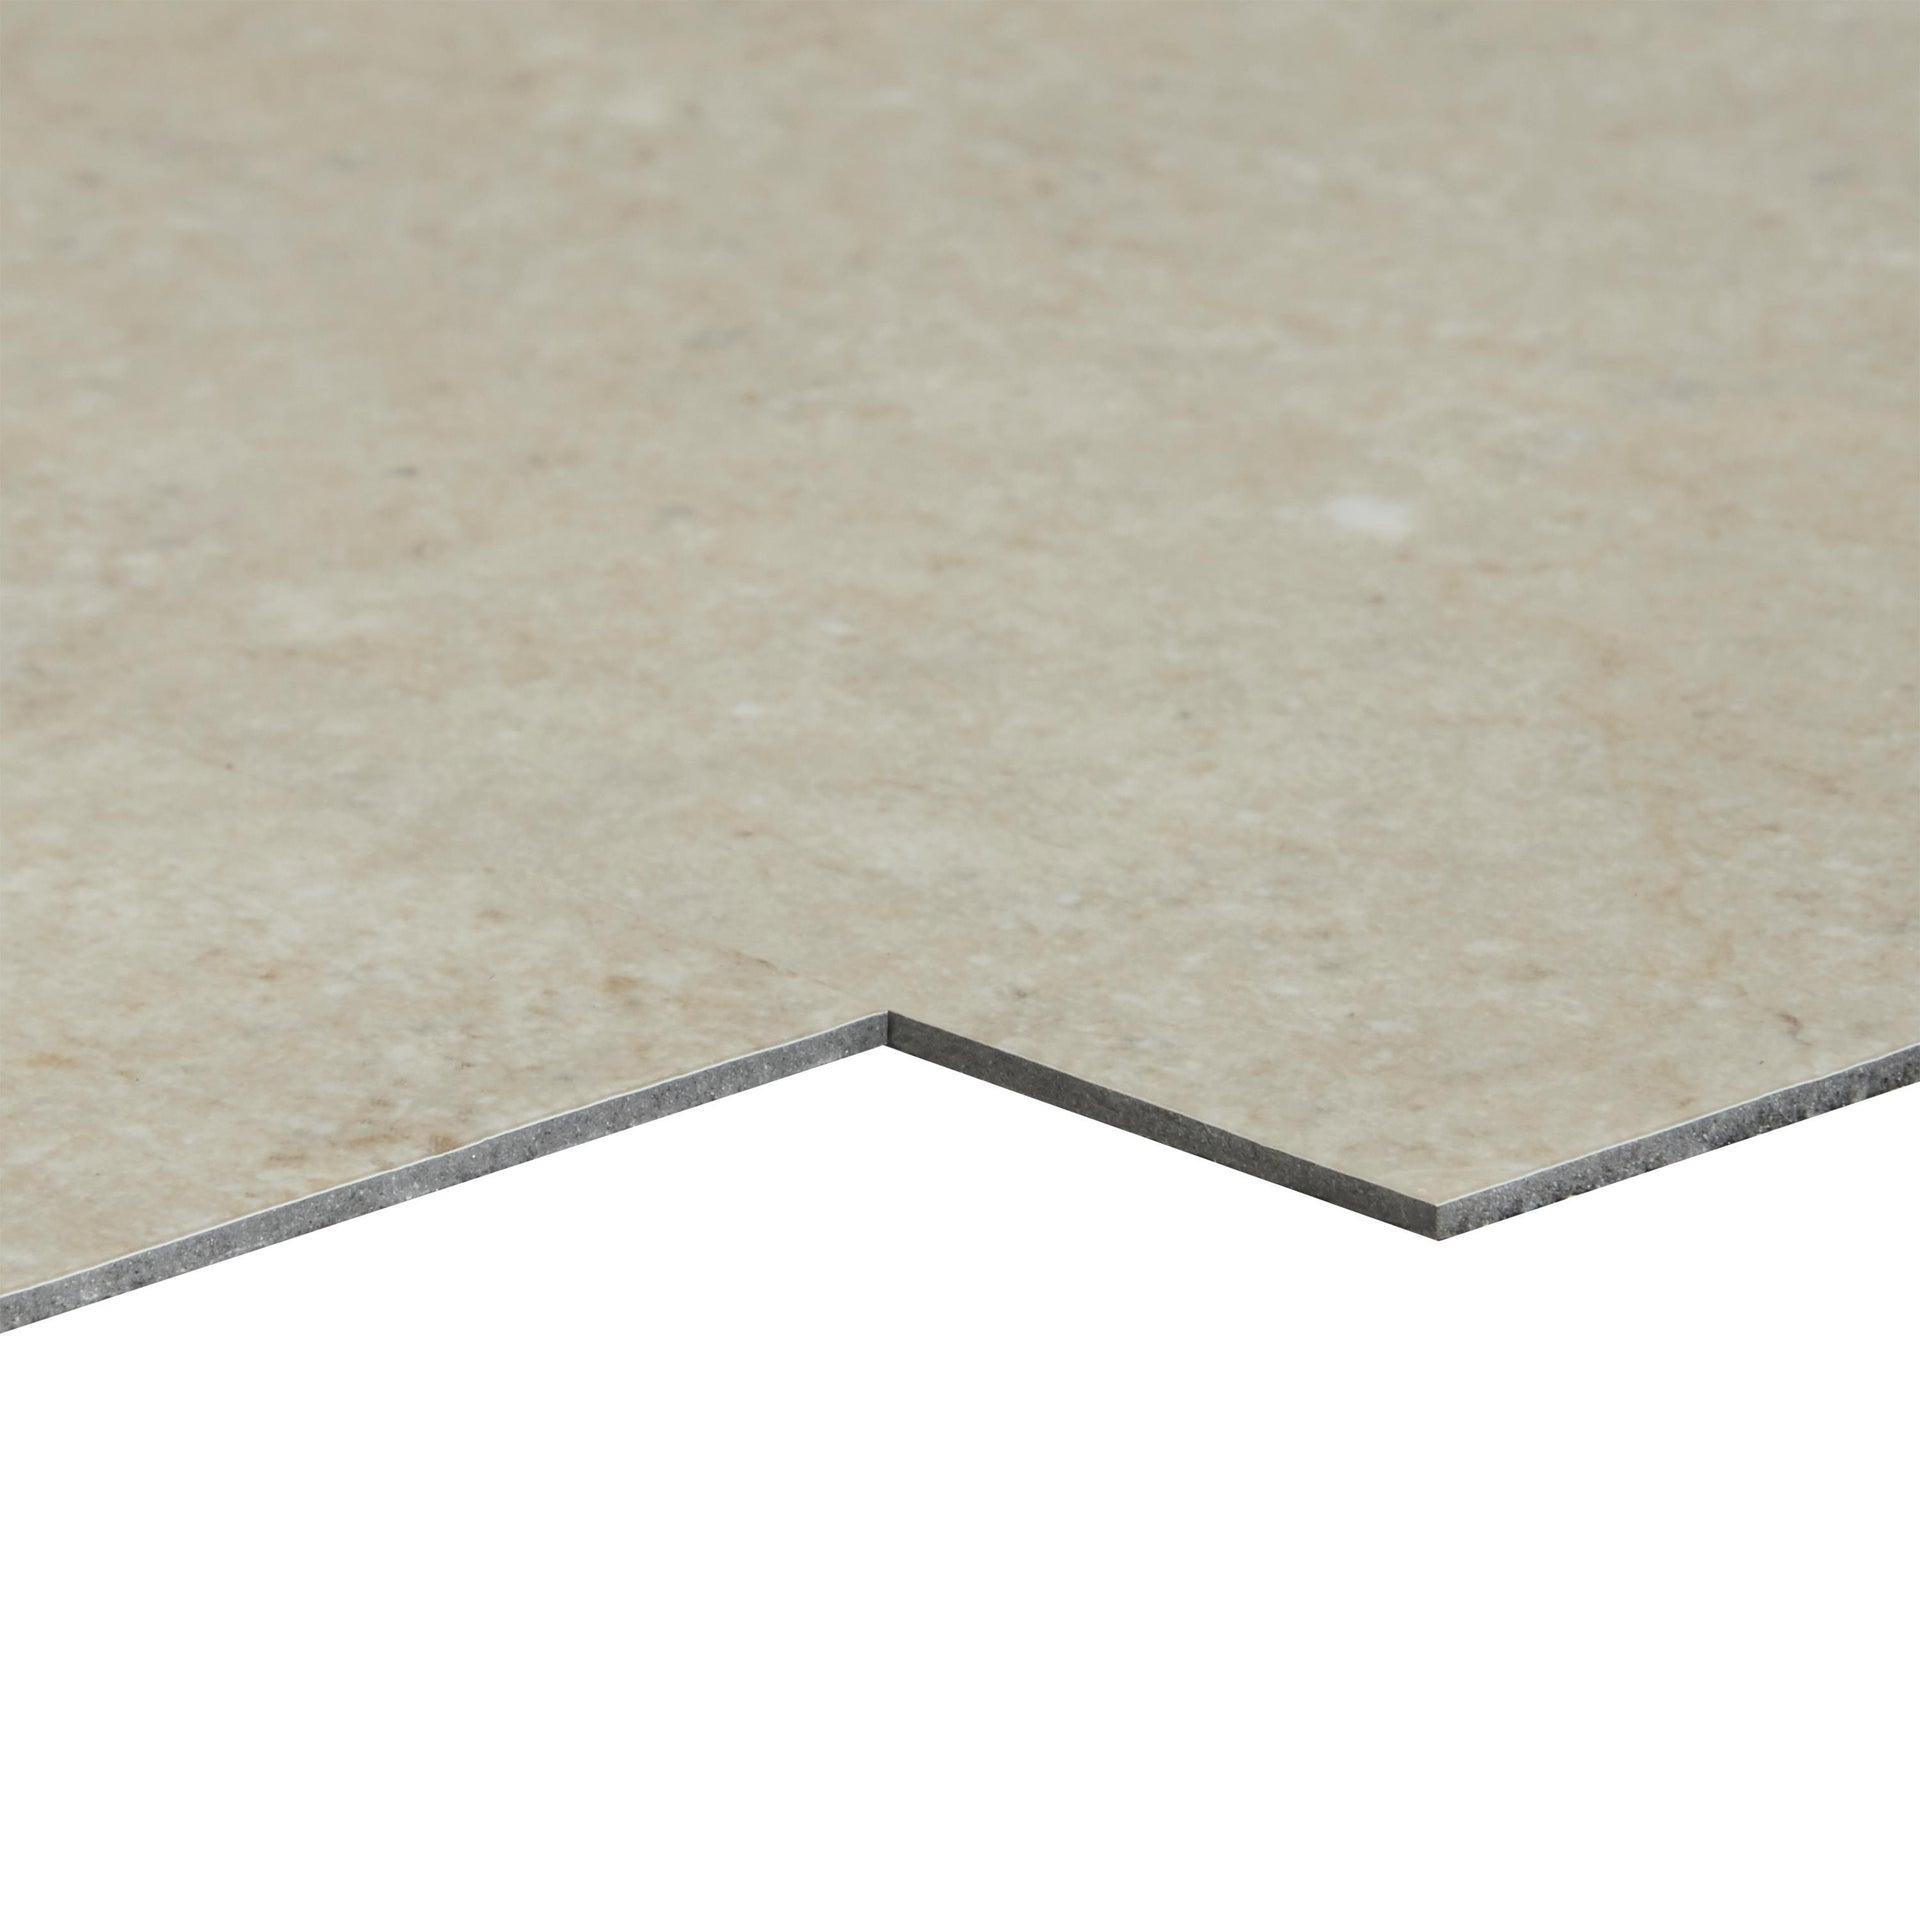 Pavimento PVC adesivo Limestone Sp 2 mm grigio / argento - 12